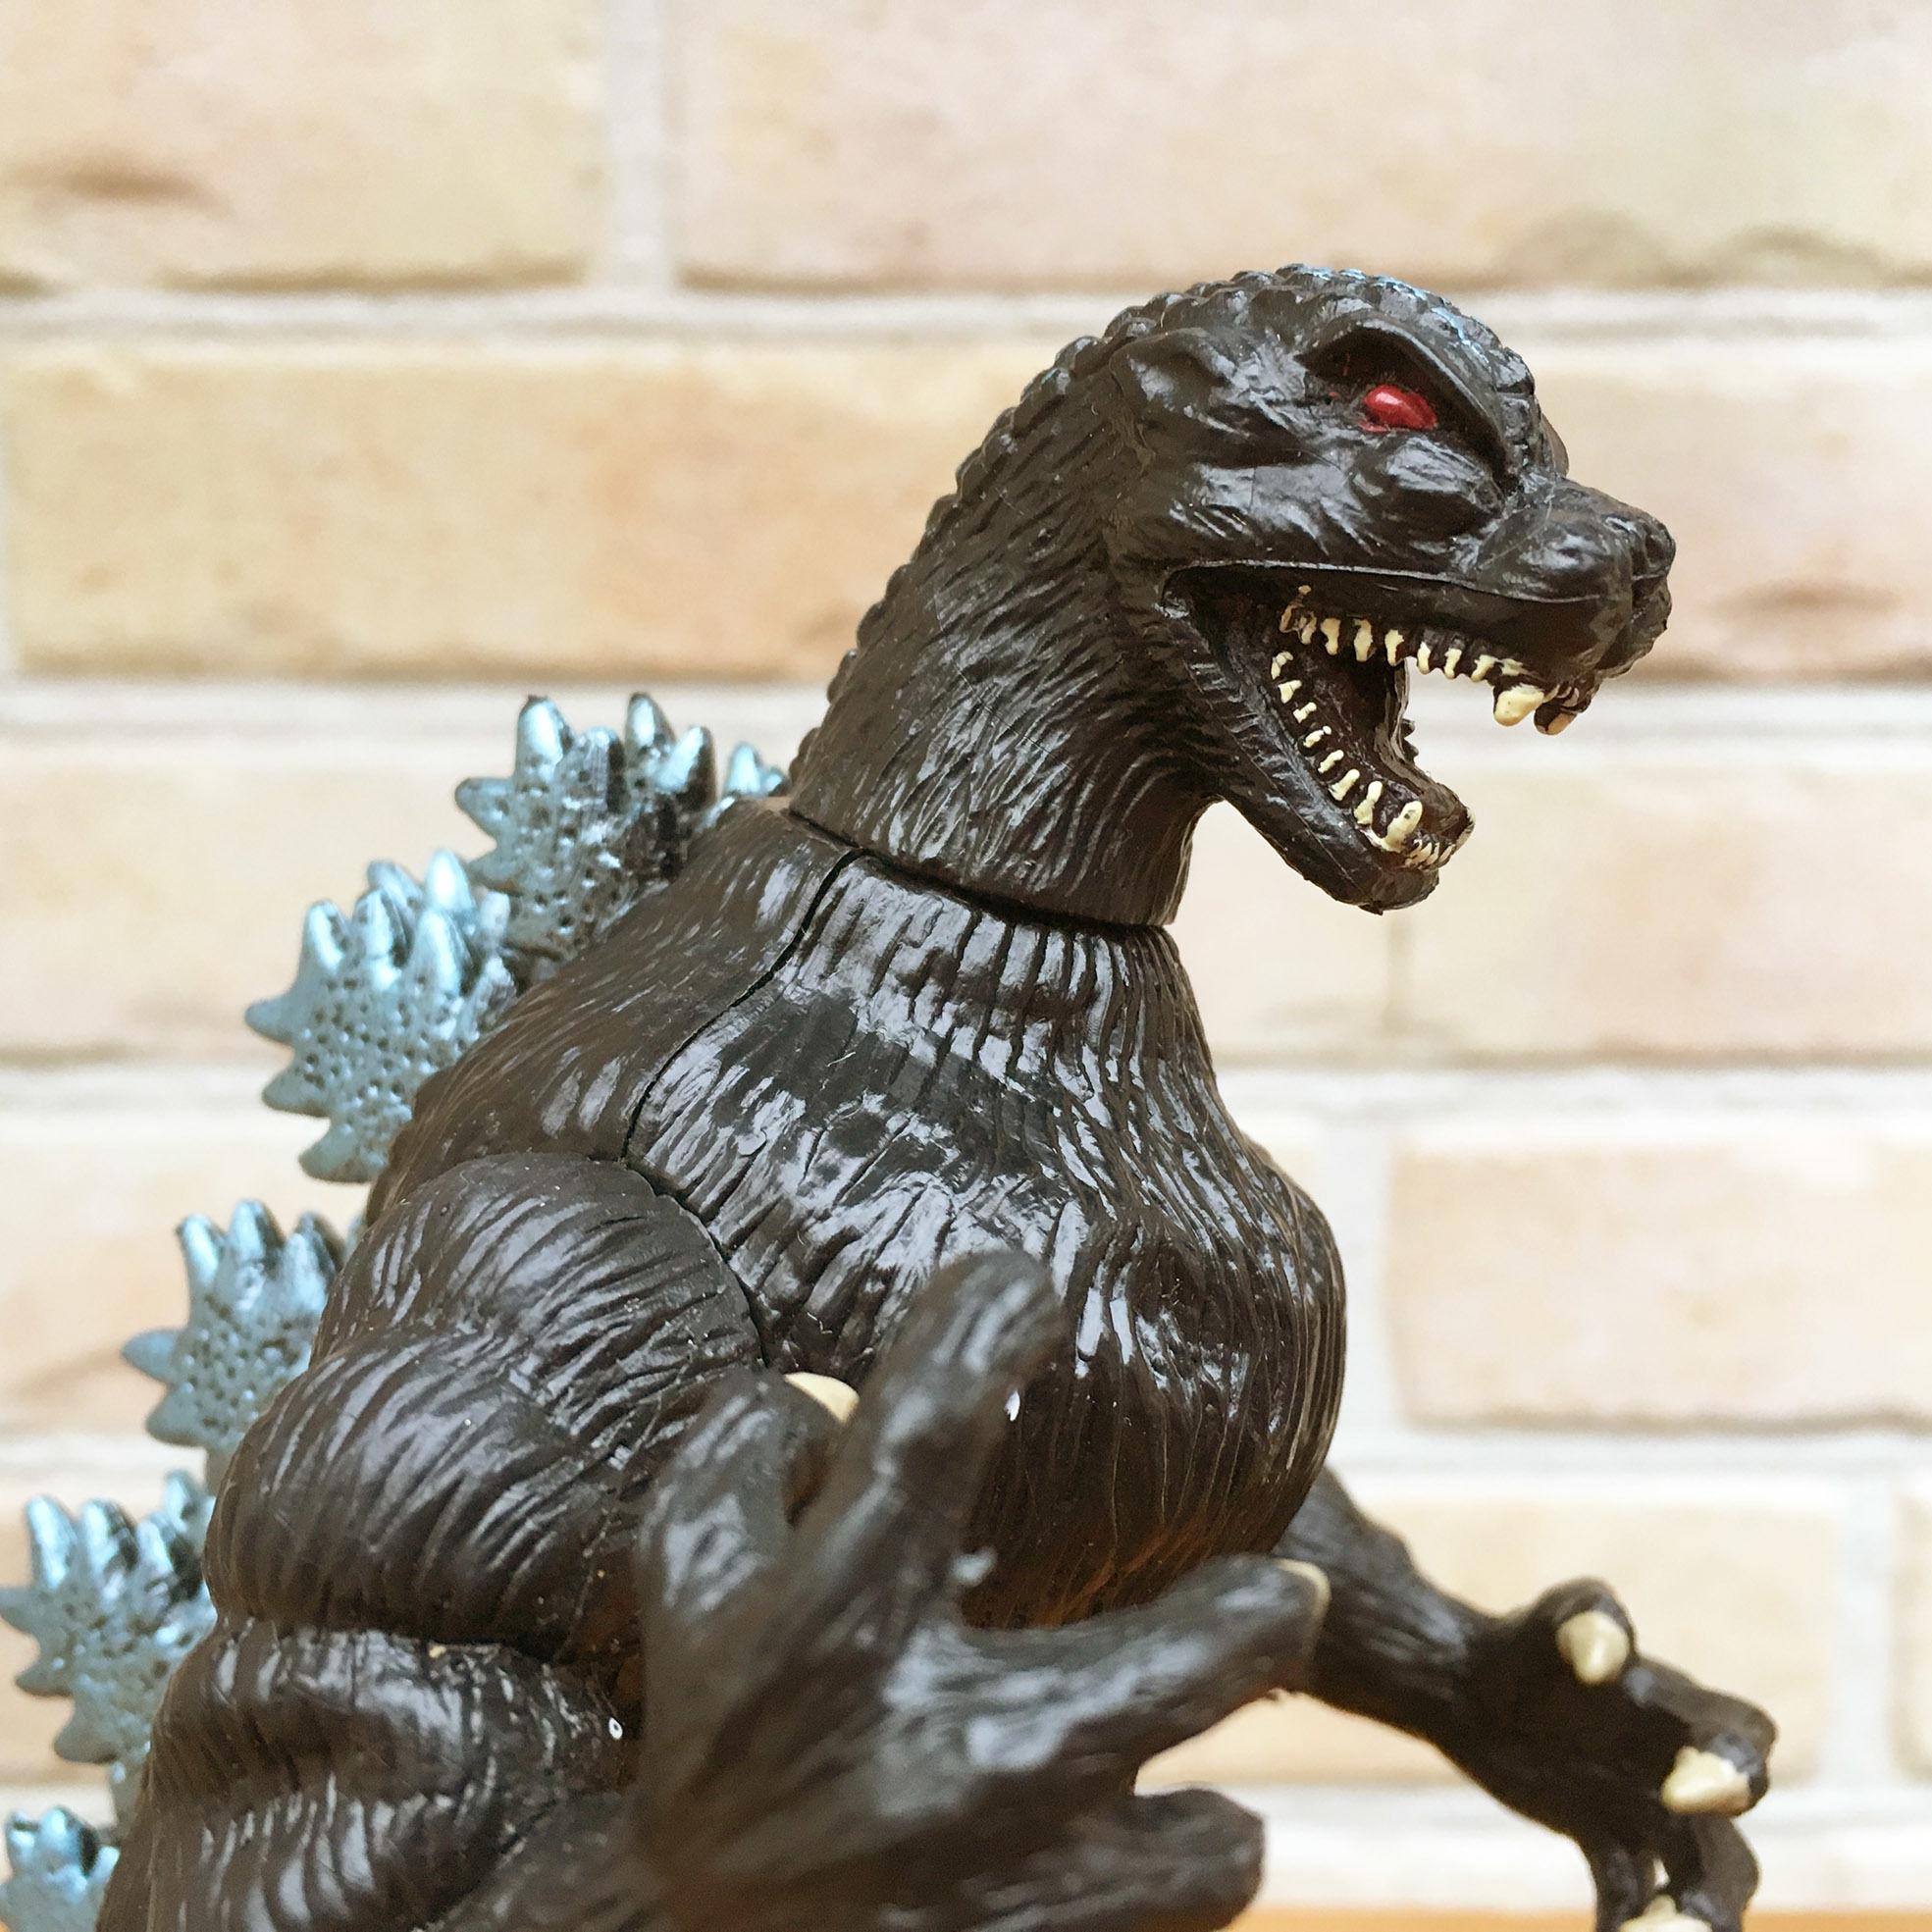 GODZILLA Supercharged Godzilla Figure/ゴジラ スーパーチャージ・ゴジラ フィギュア/171130-1